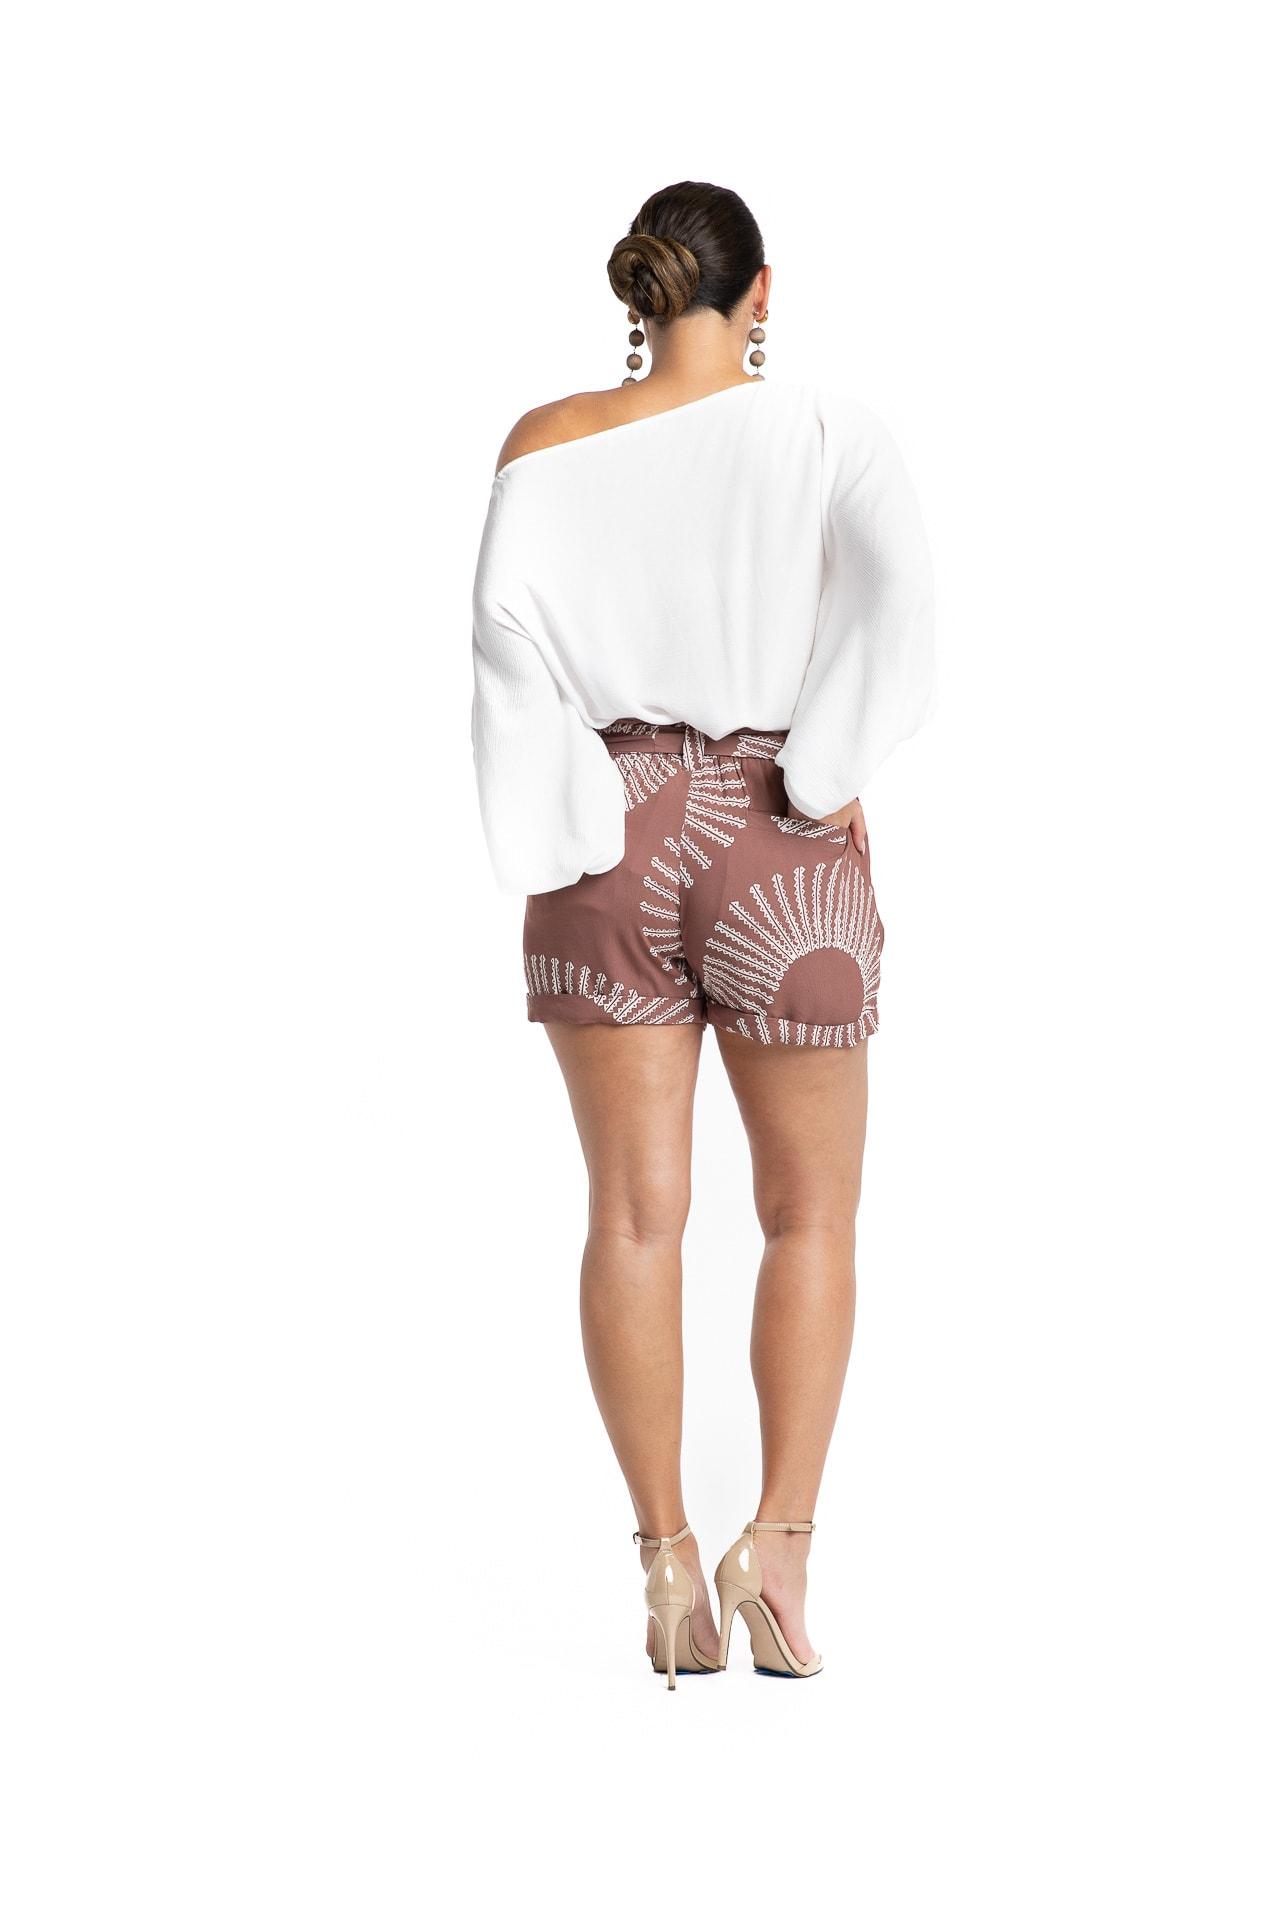 Model wearing Pua Ula Shorts with Belt - Back View